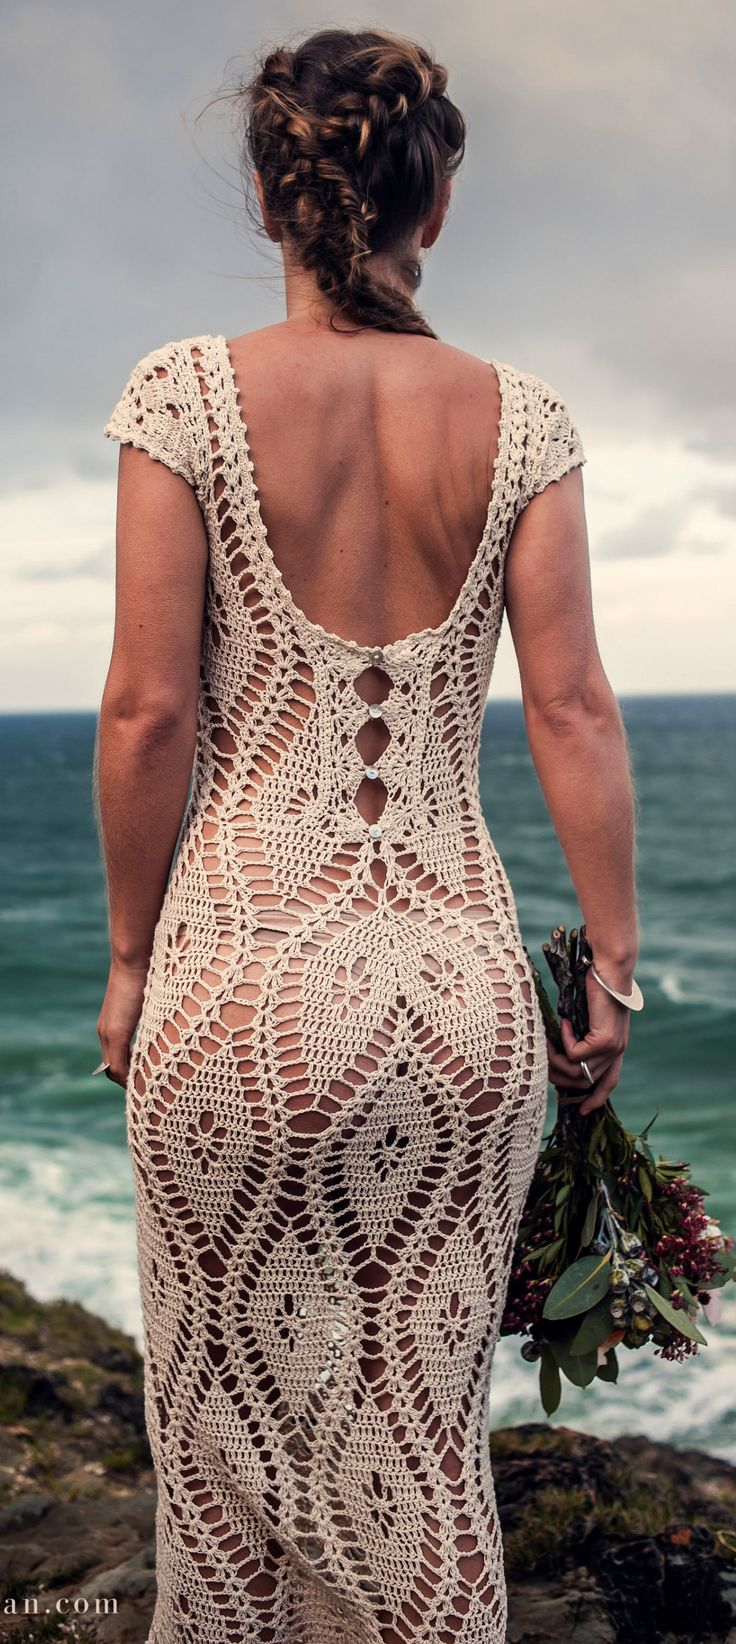 handmade crochet dress by IsaCatepillan on Etsy